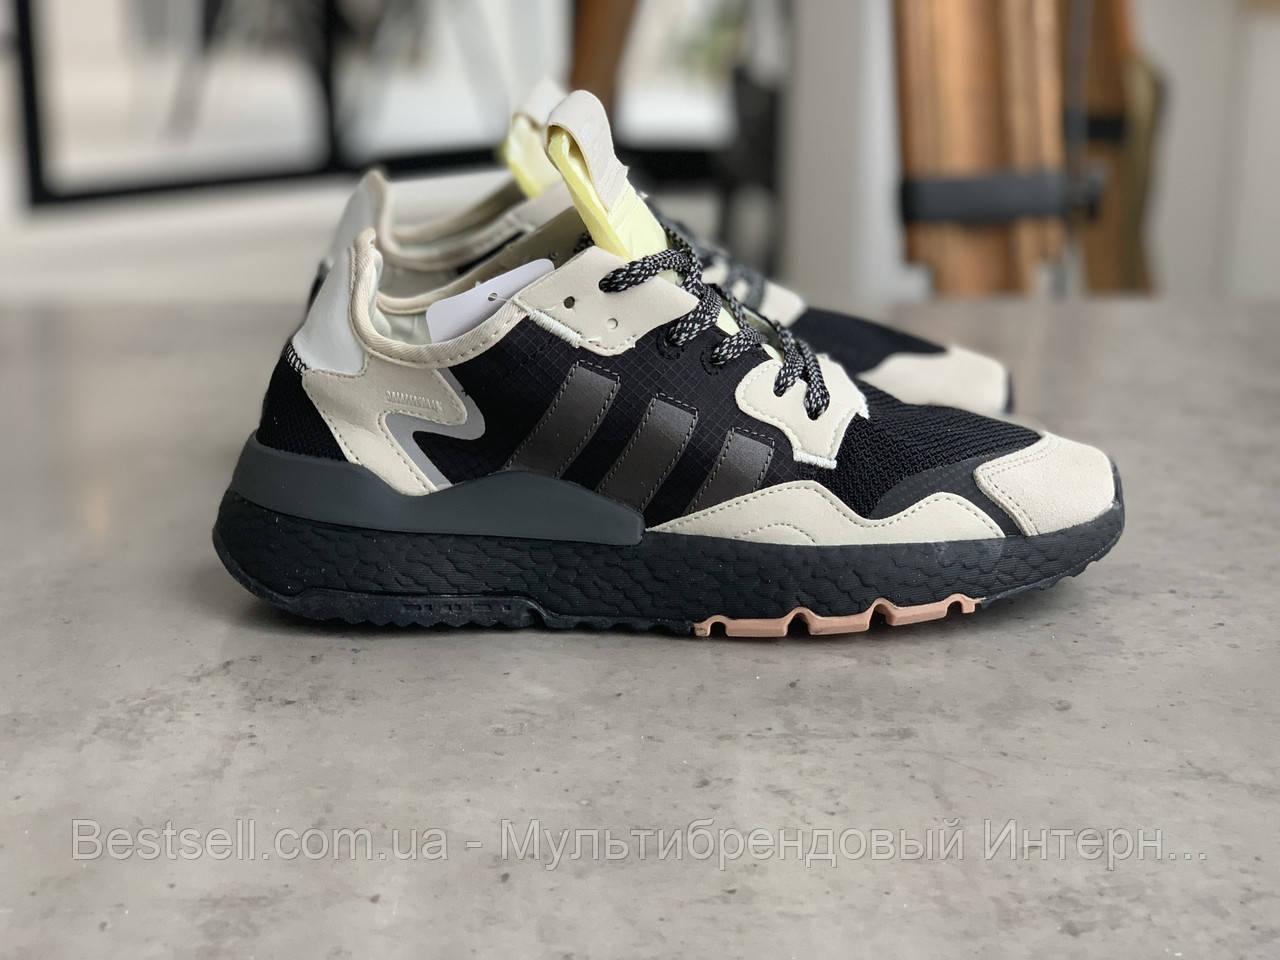 Кросівки Adidas Nite Jogger Адідас Найт Джоггер (41,42,43,44,45)